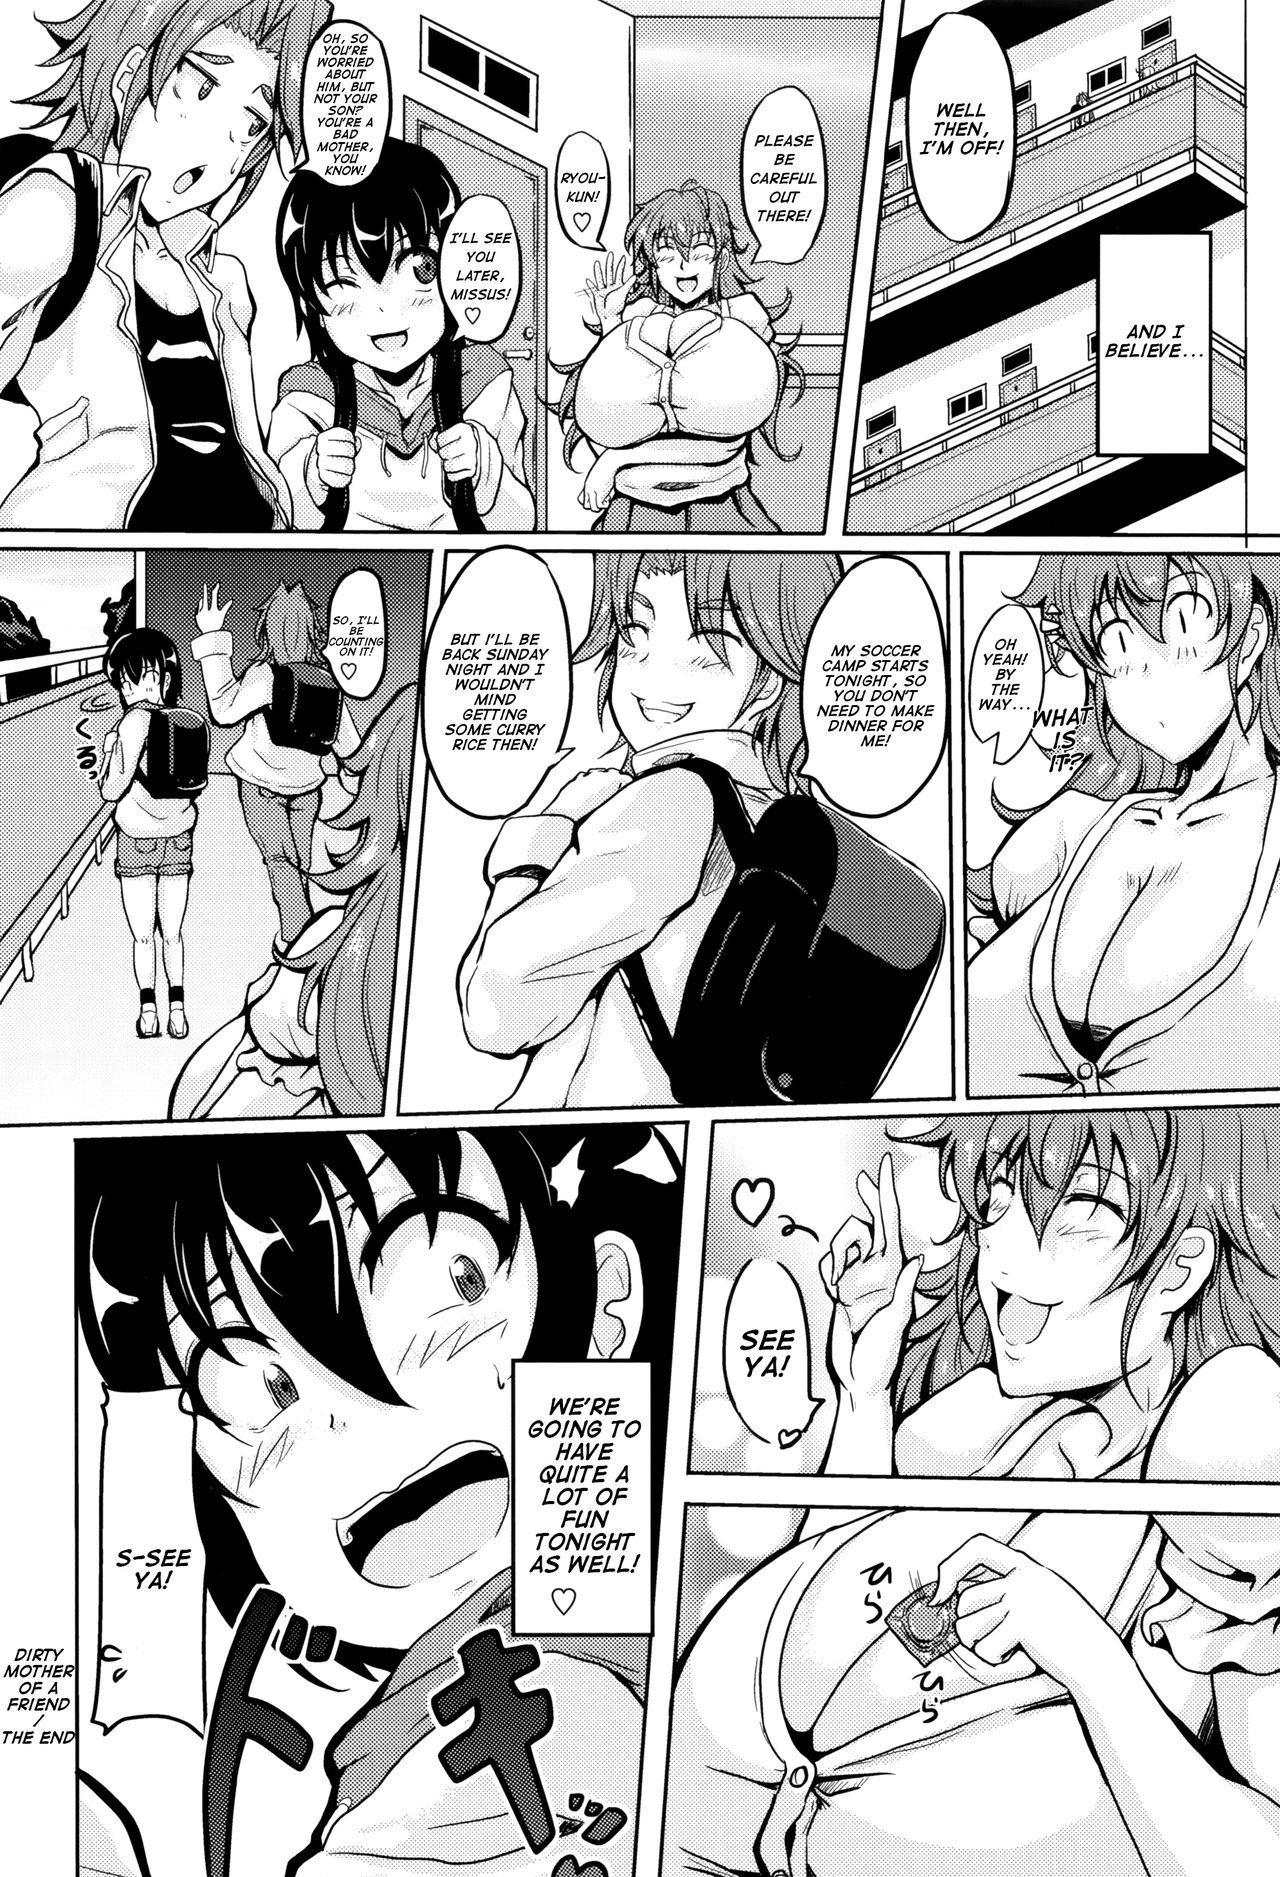 Ikenai Tomohaha | Dirty Mother of a Friend 19